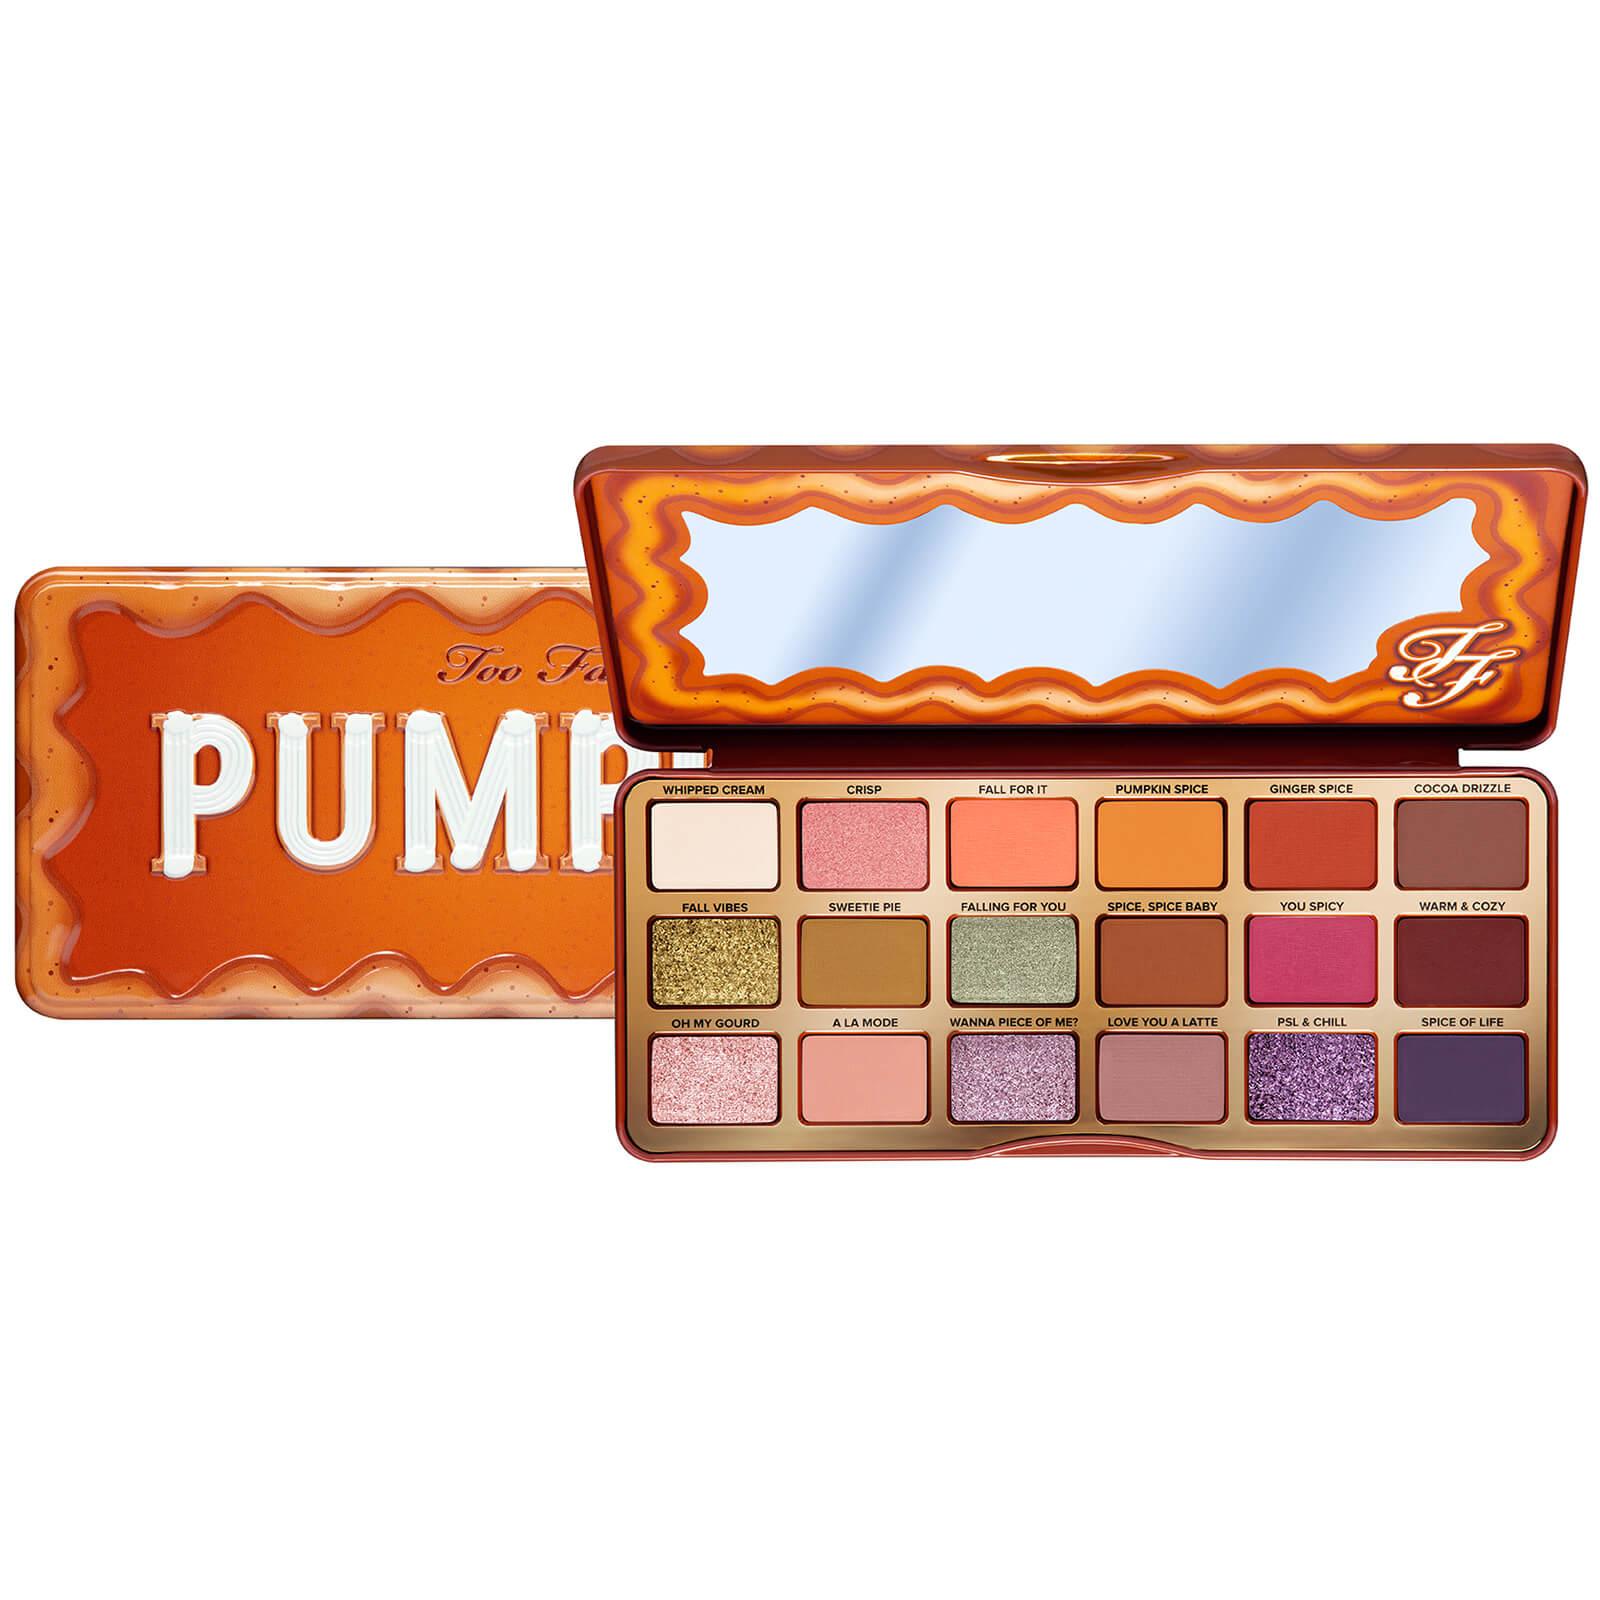 Paleta Too Faced Pumpkin Spice a 34 euros en LF!!